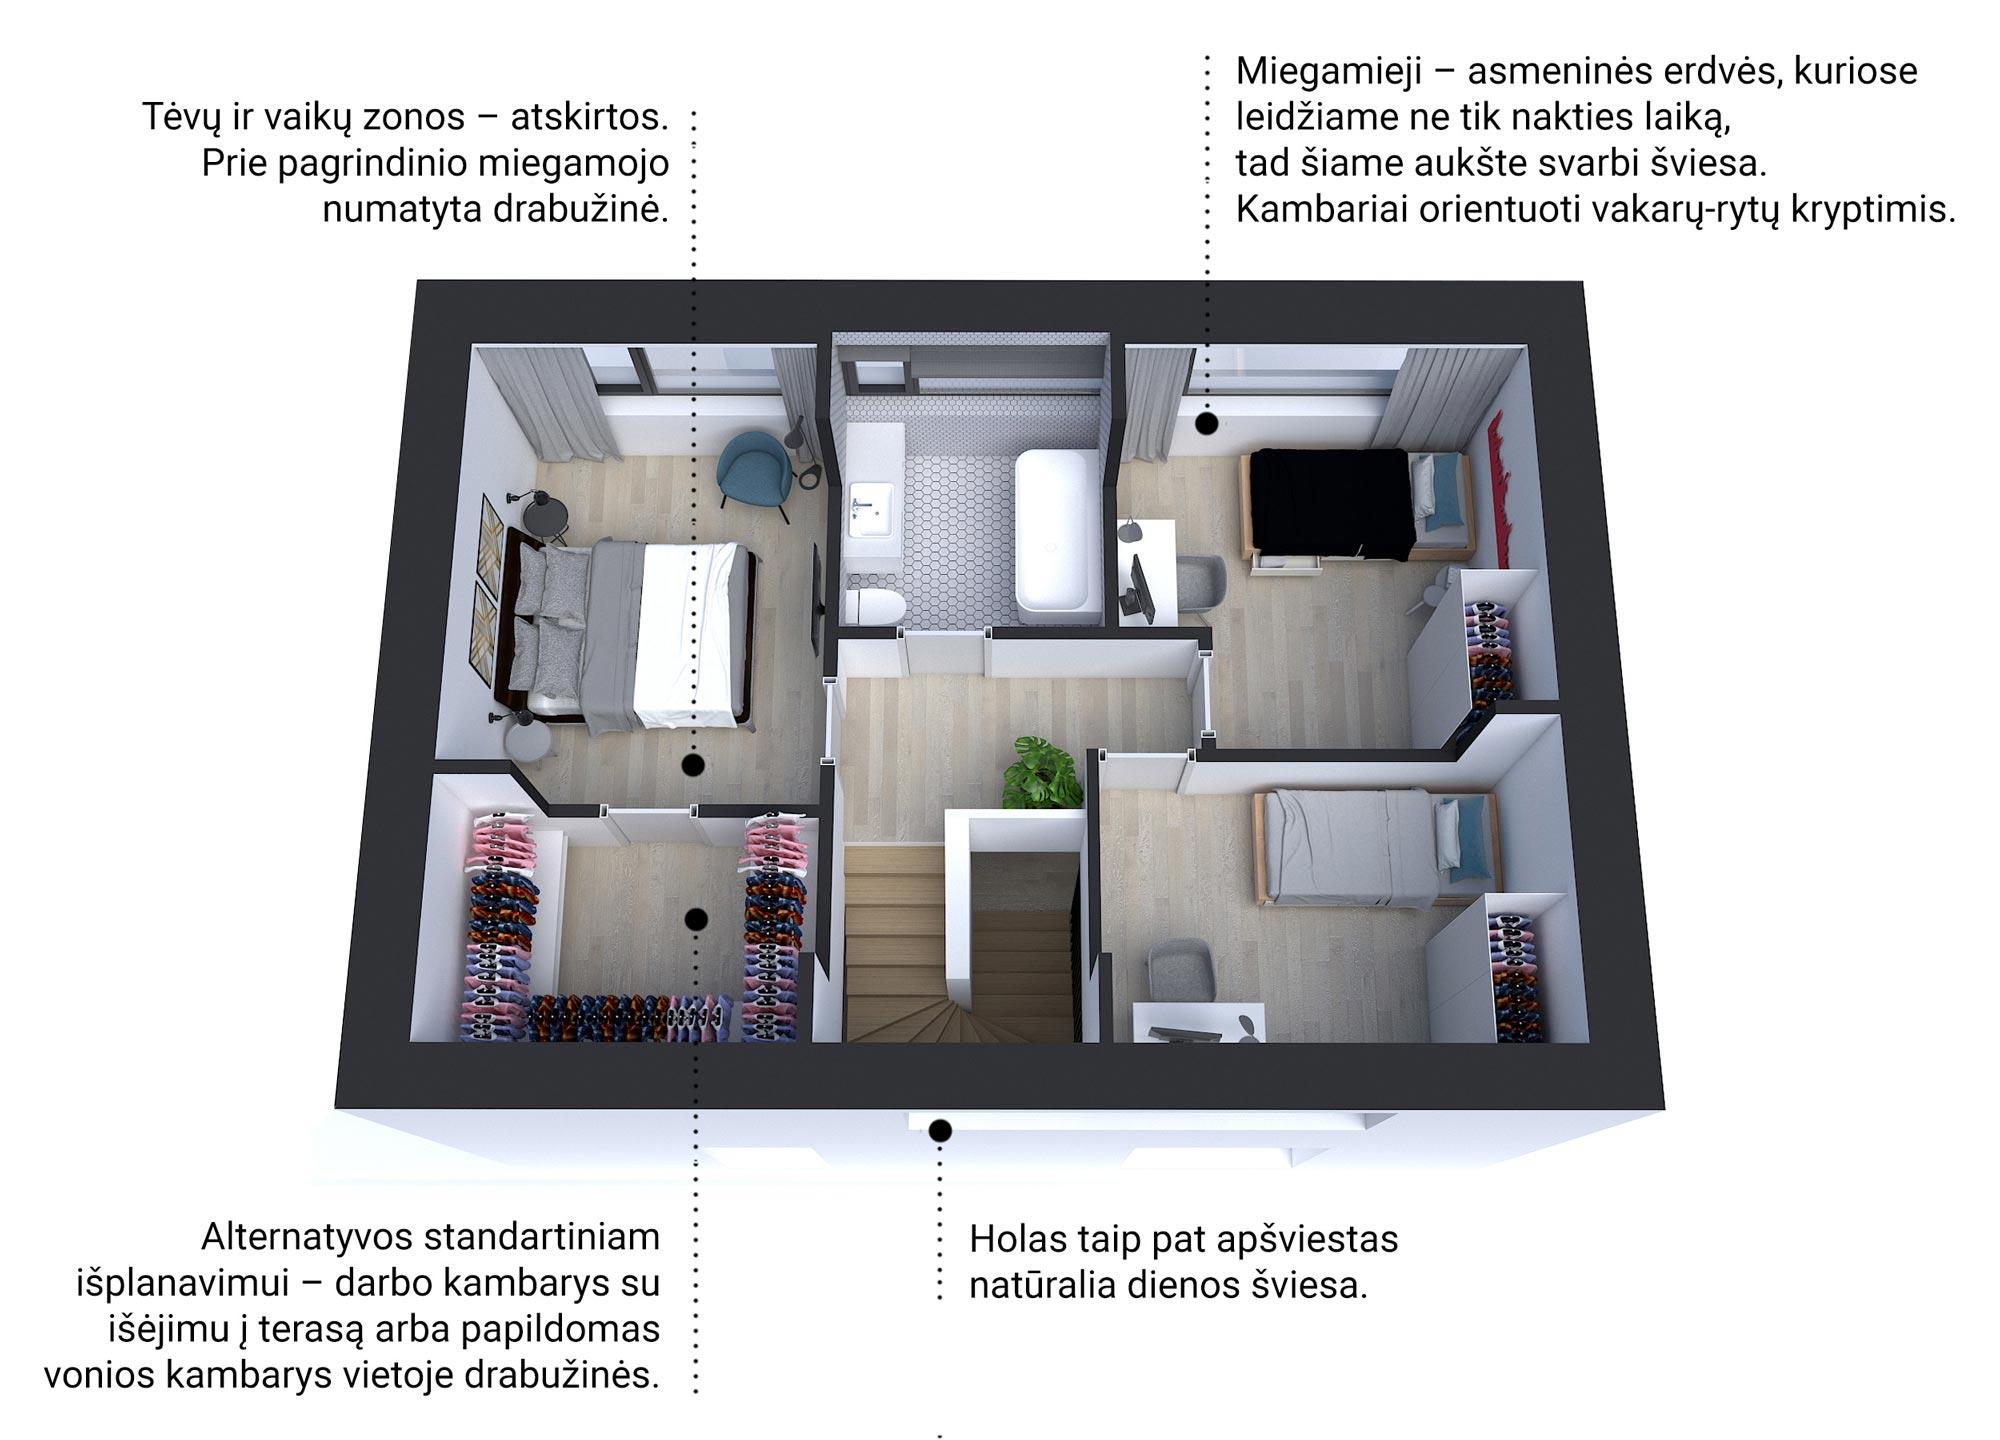 kubinis-metras_balti-balti-namai_kvartalas_2a3d-planas